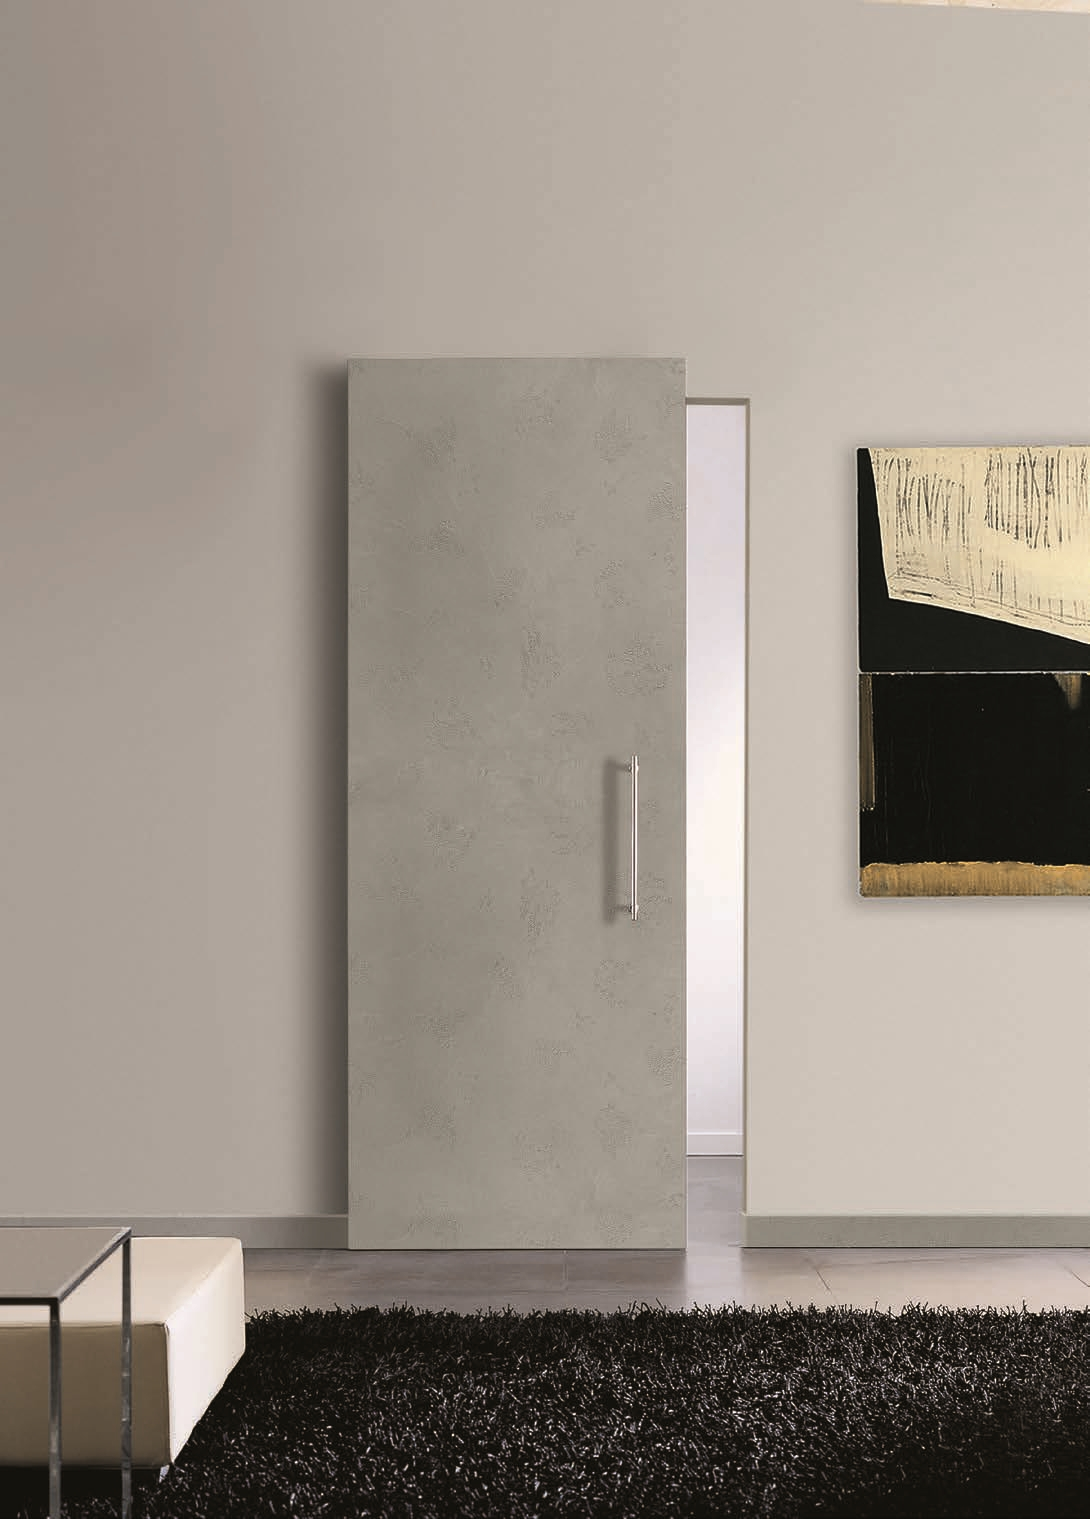 Porta GD Dorigo Pegaso Moderne Scorrevole - Porte a prezzi scontati